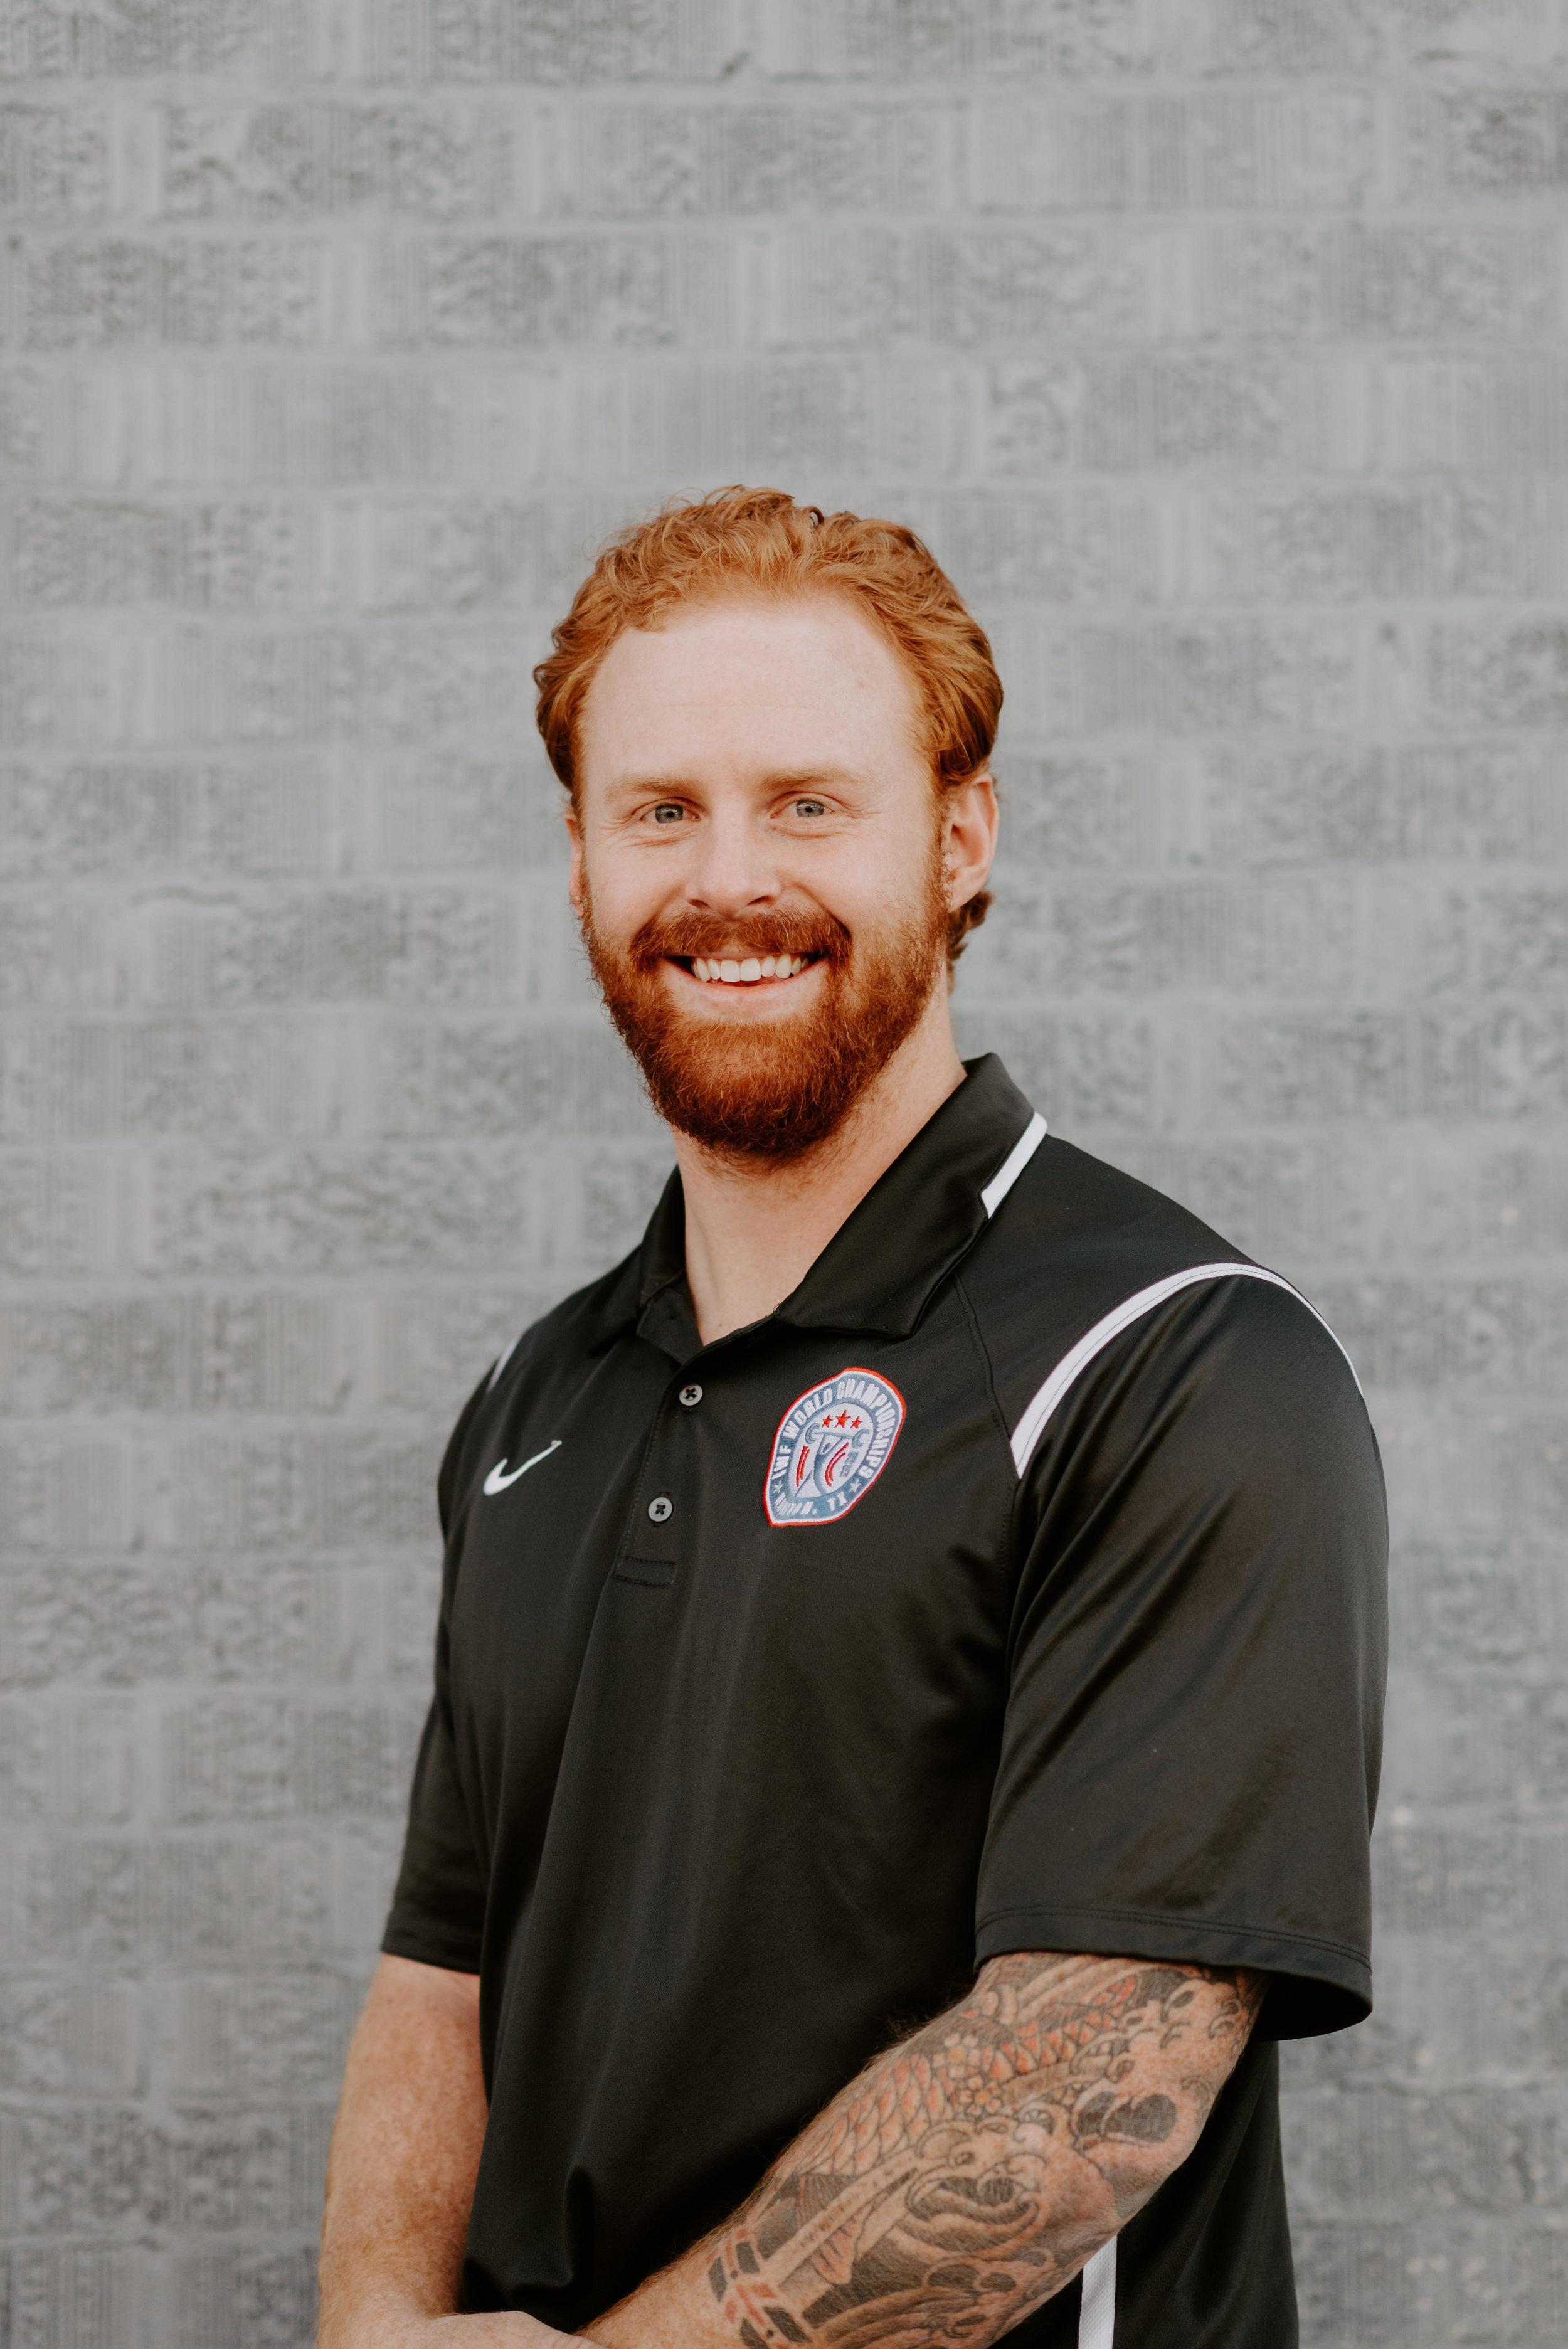 Darren Hansen, BS Exercise Science,CSCS, USAW National Coach, Owner of HansenAthletics